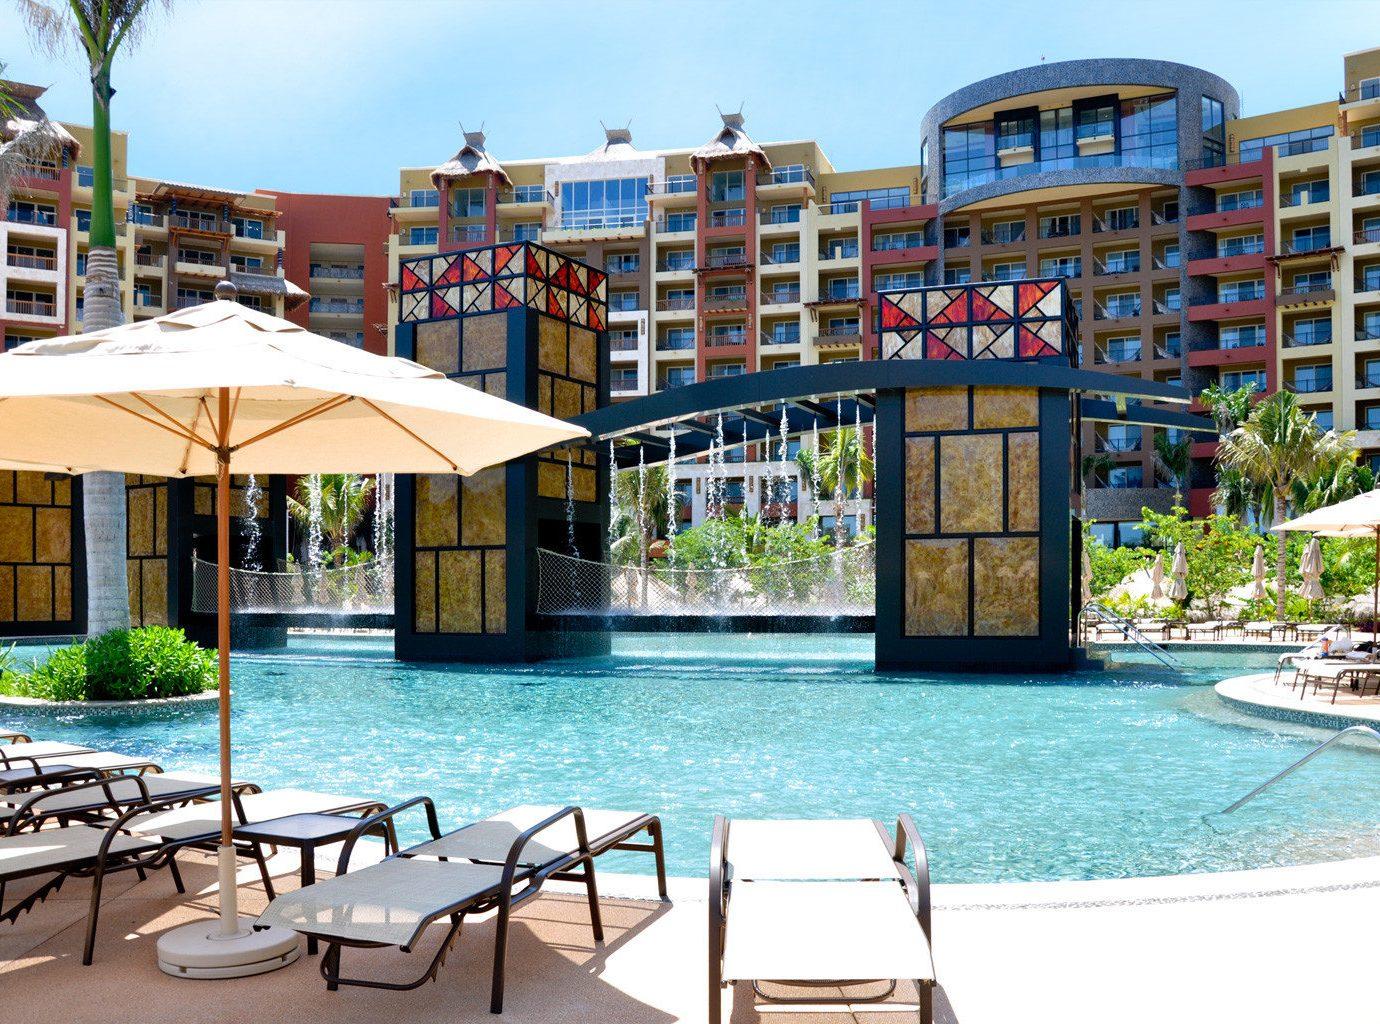 chair condominium leisure property Resort swimming pool home lawn plaza